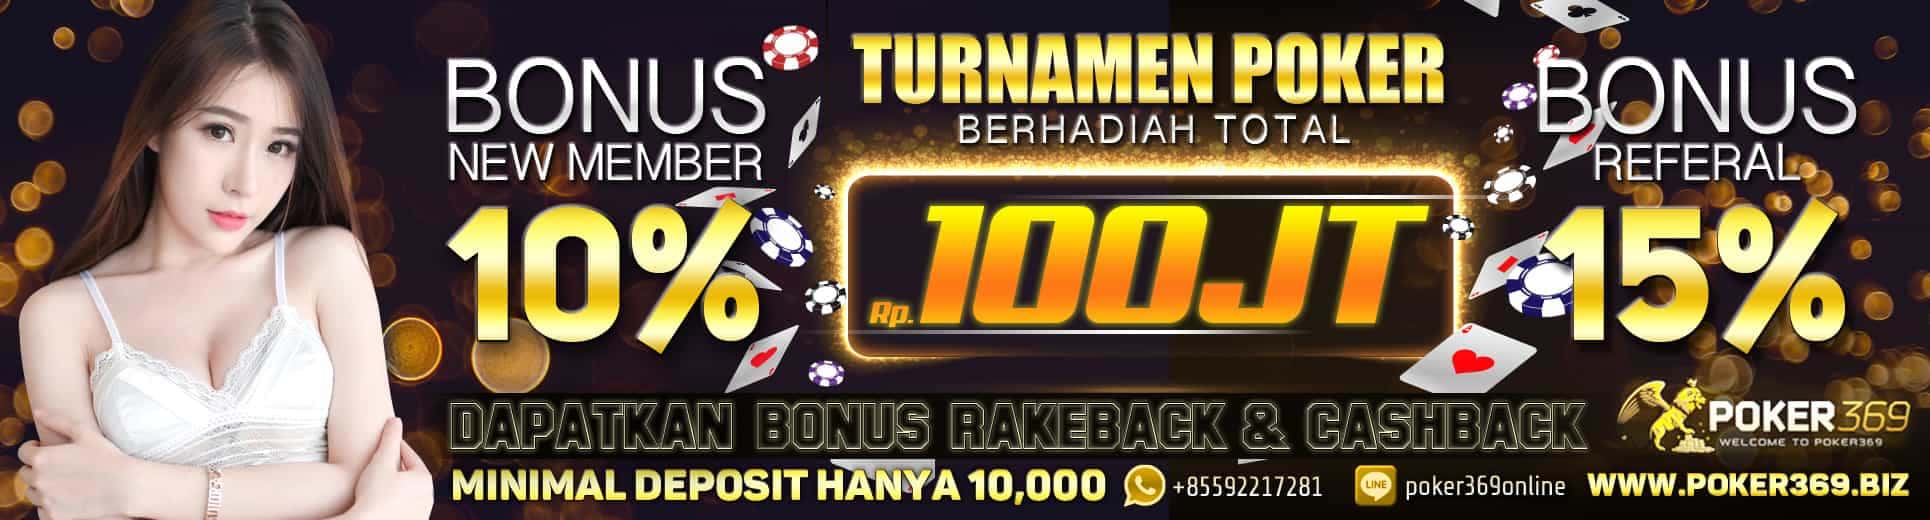 IDN POKER ONLINE Slot Online bet gratis